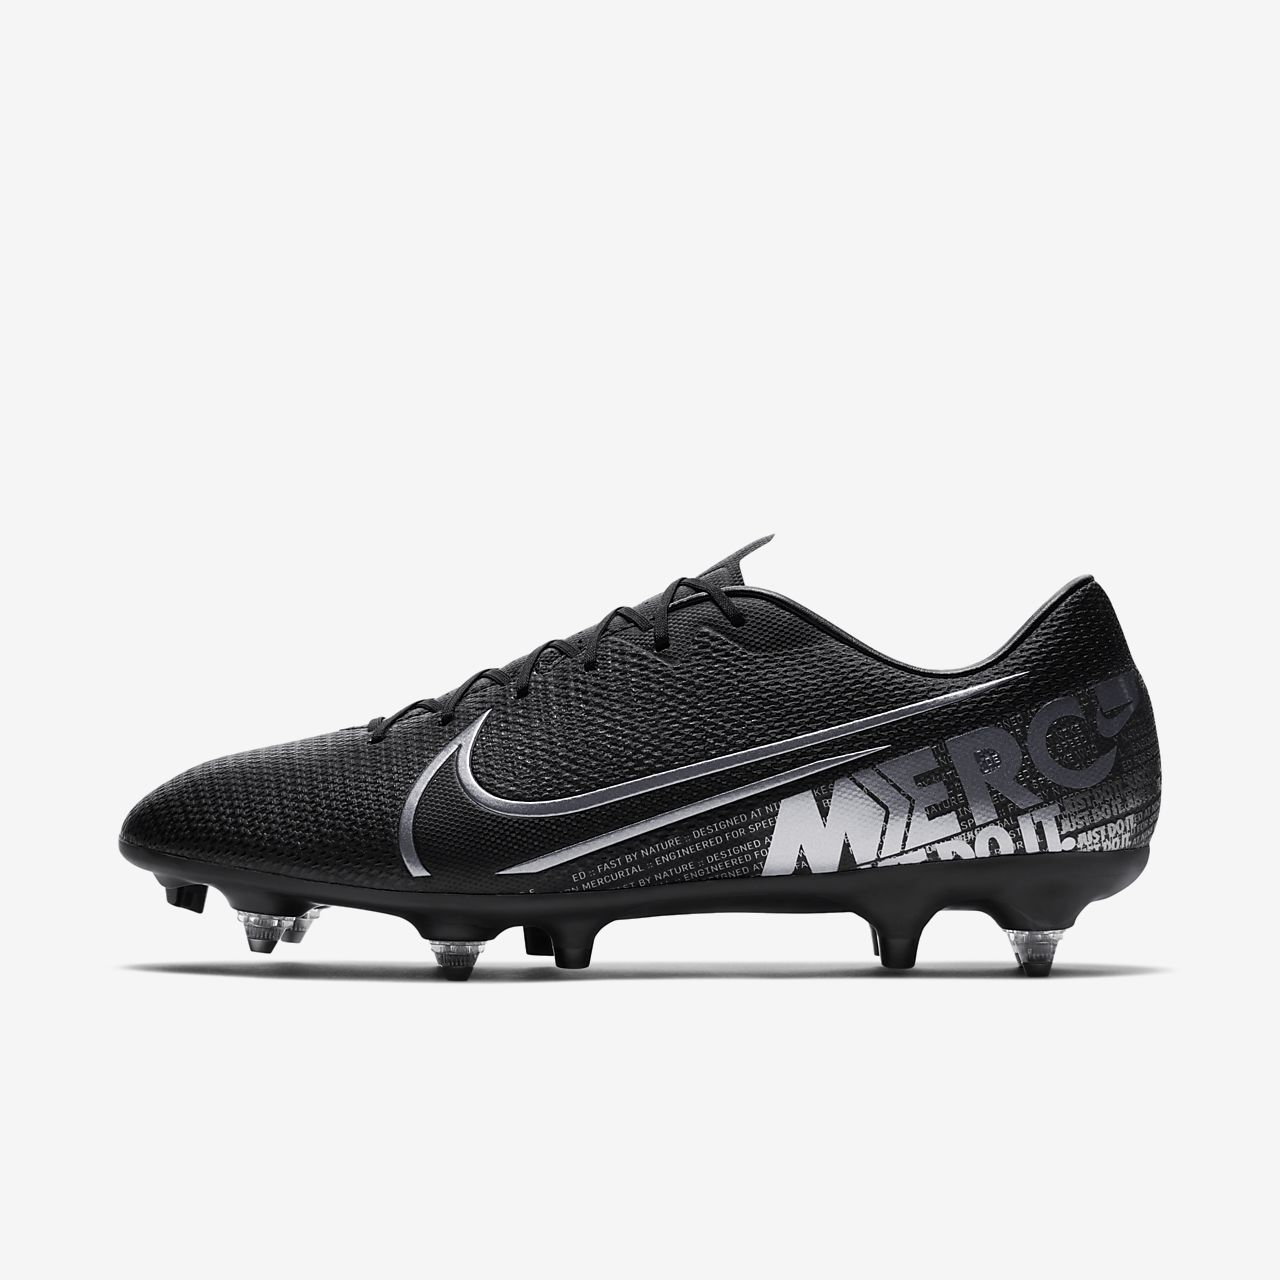 Chaussure de football à crampons pour terrain gras Nike Mercurial Vapor 13 Academy SG PRO Anti Clog Traction